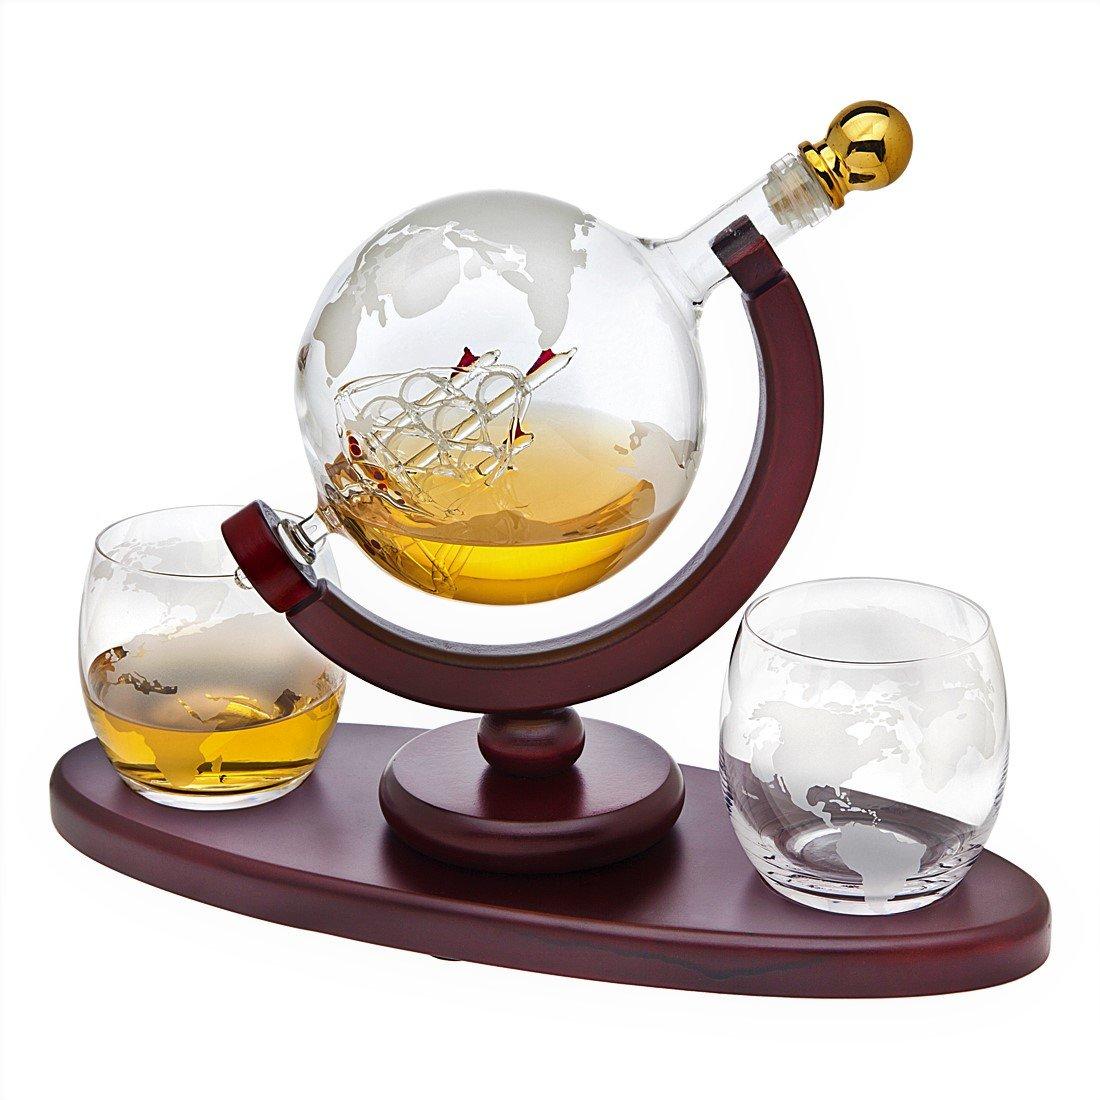 Amazon.com: Decanters - Bar Tools & Glasses: Home & Kitchen: Wine ...